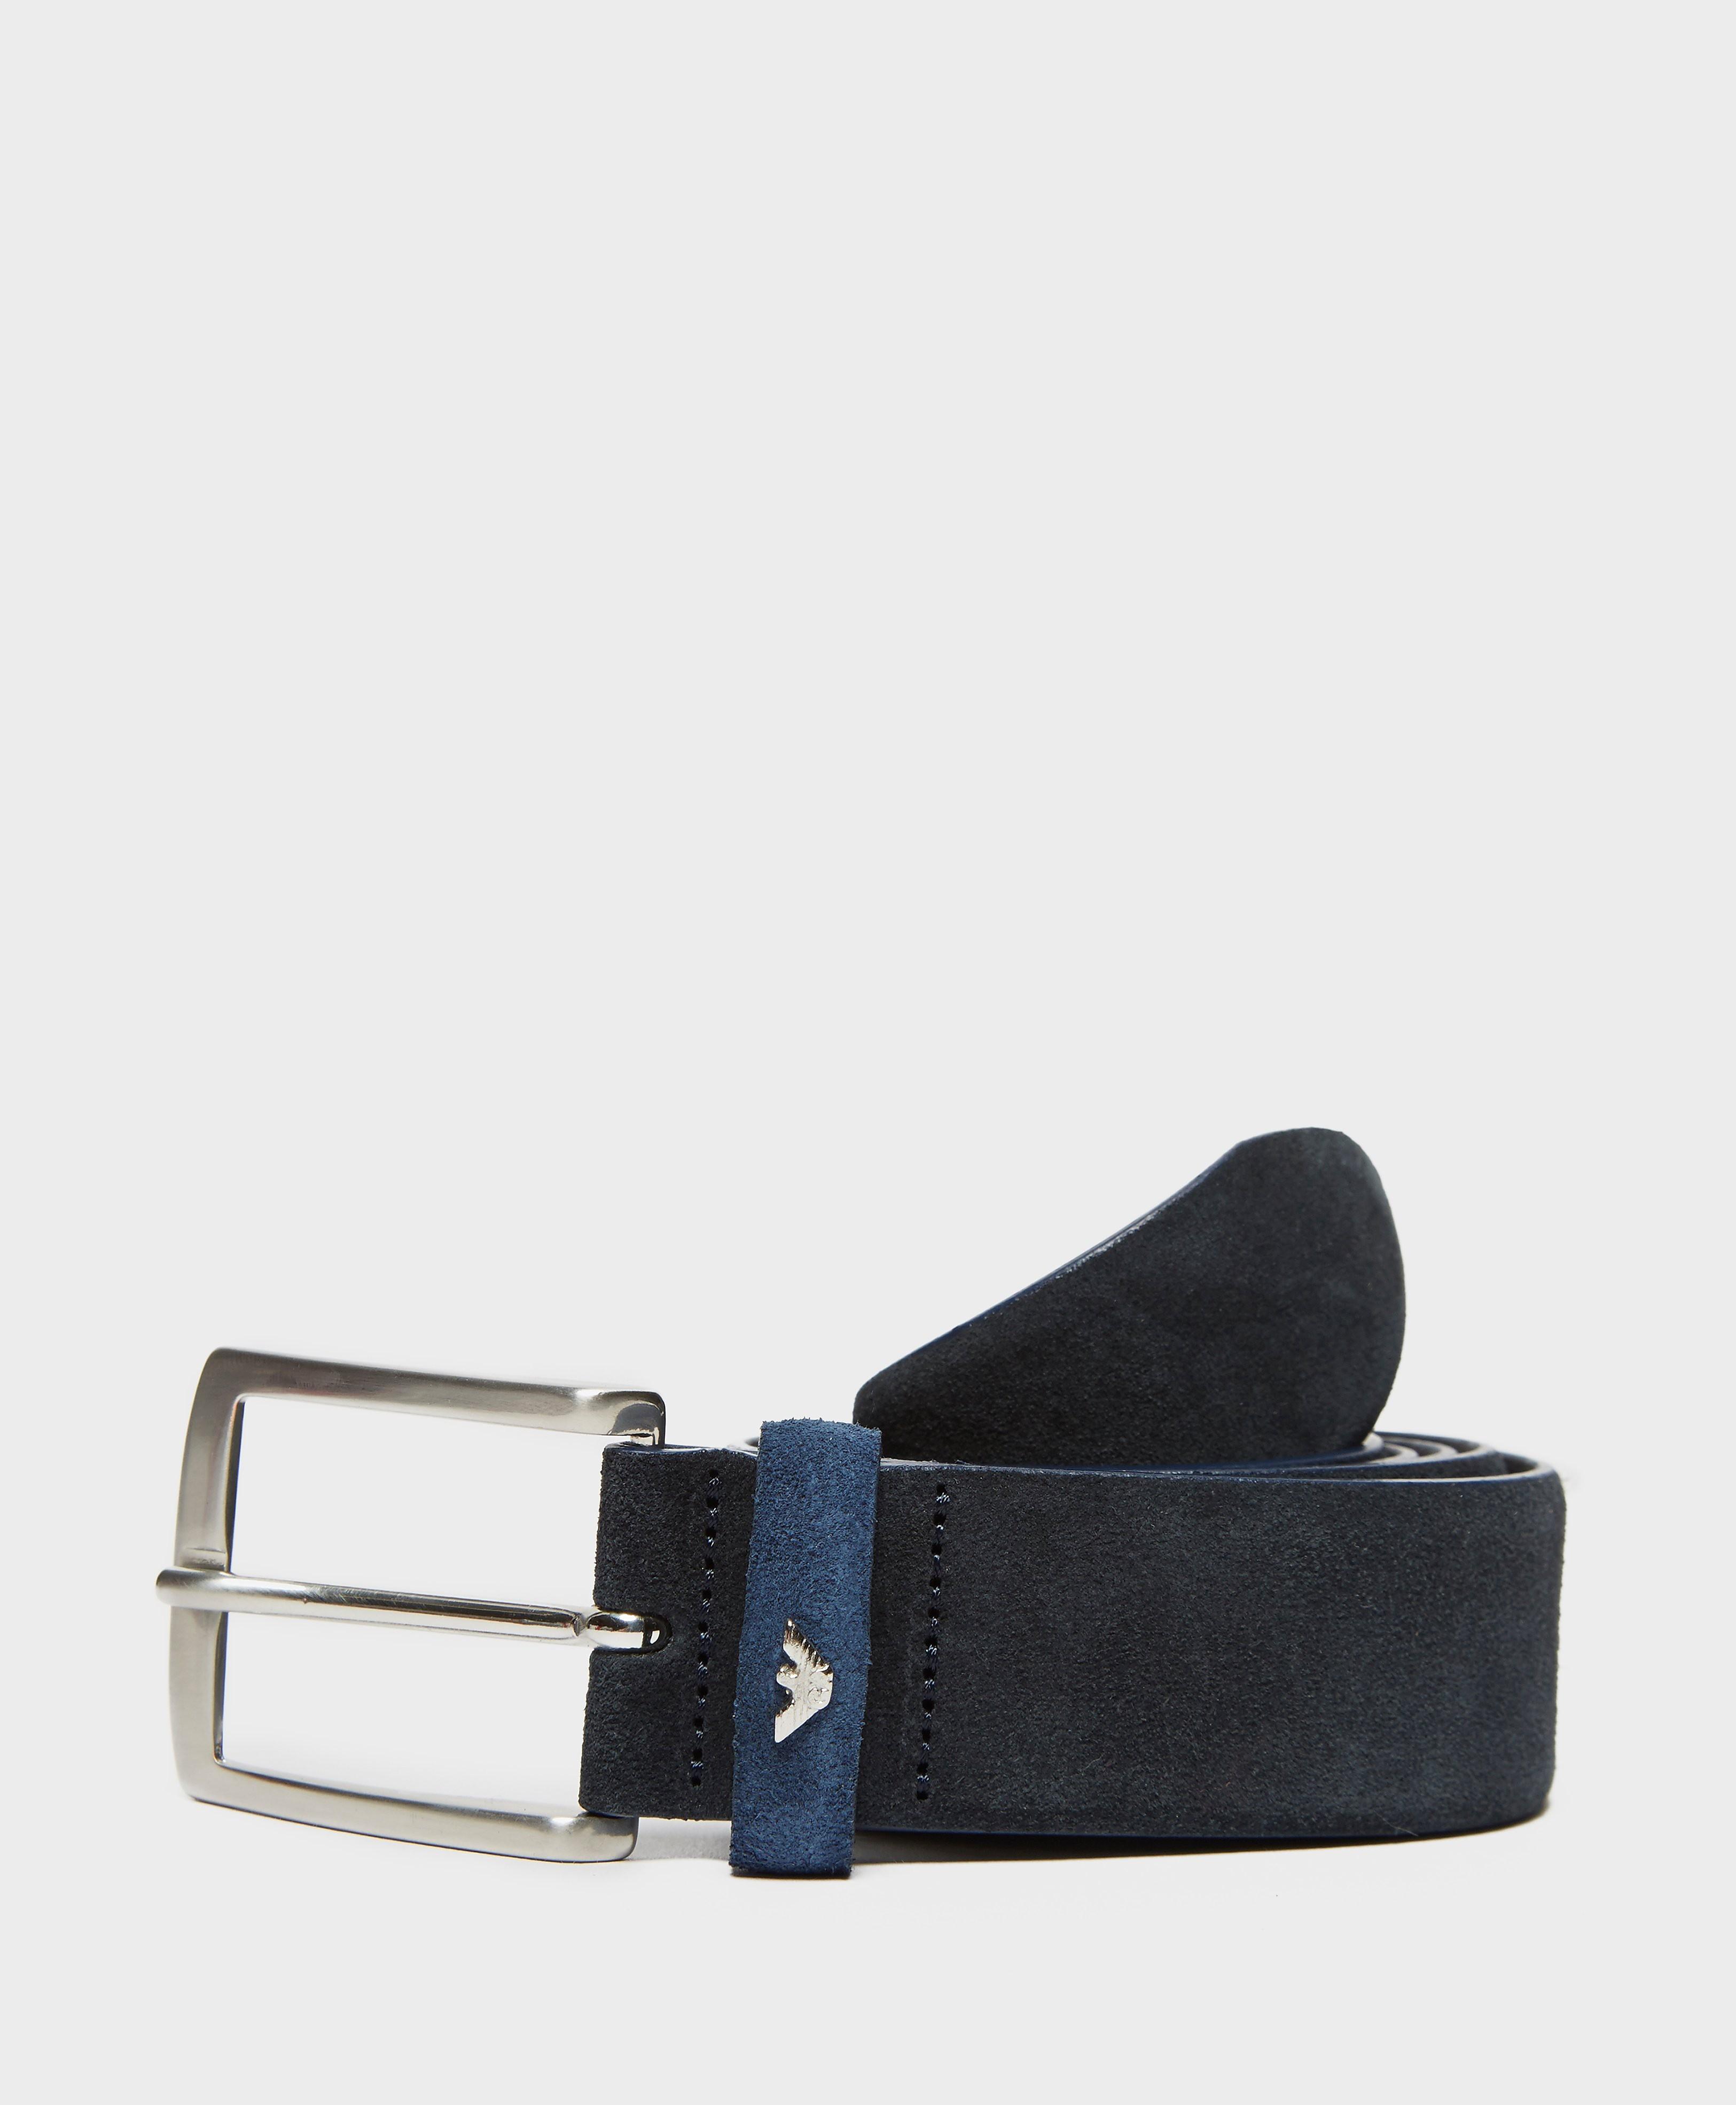 Armani Jeans Suede Belt  Blue Blue